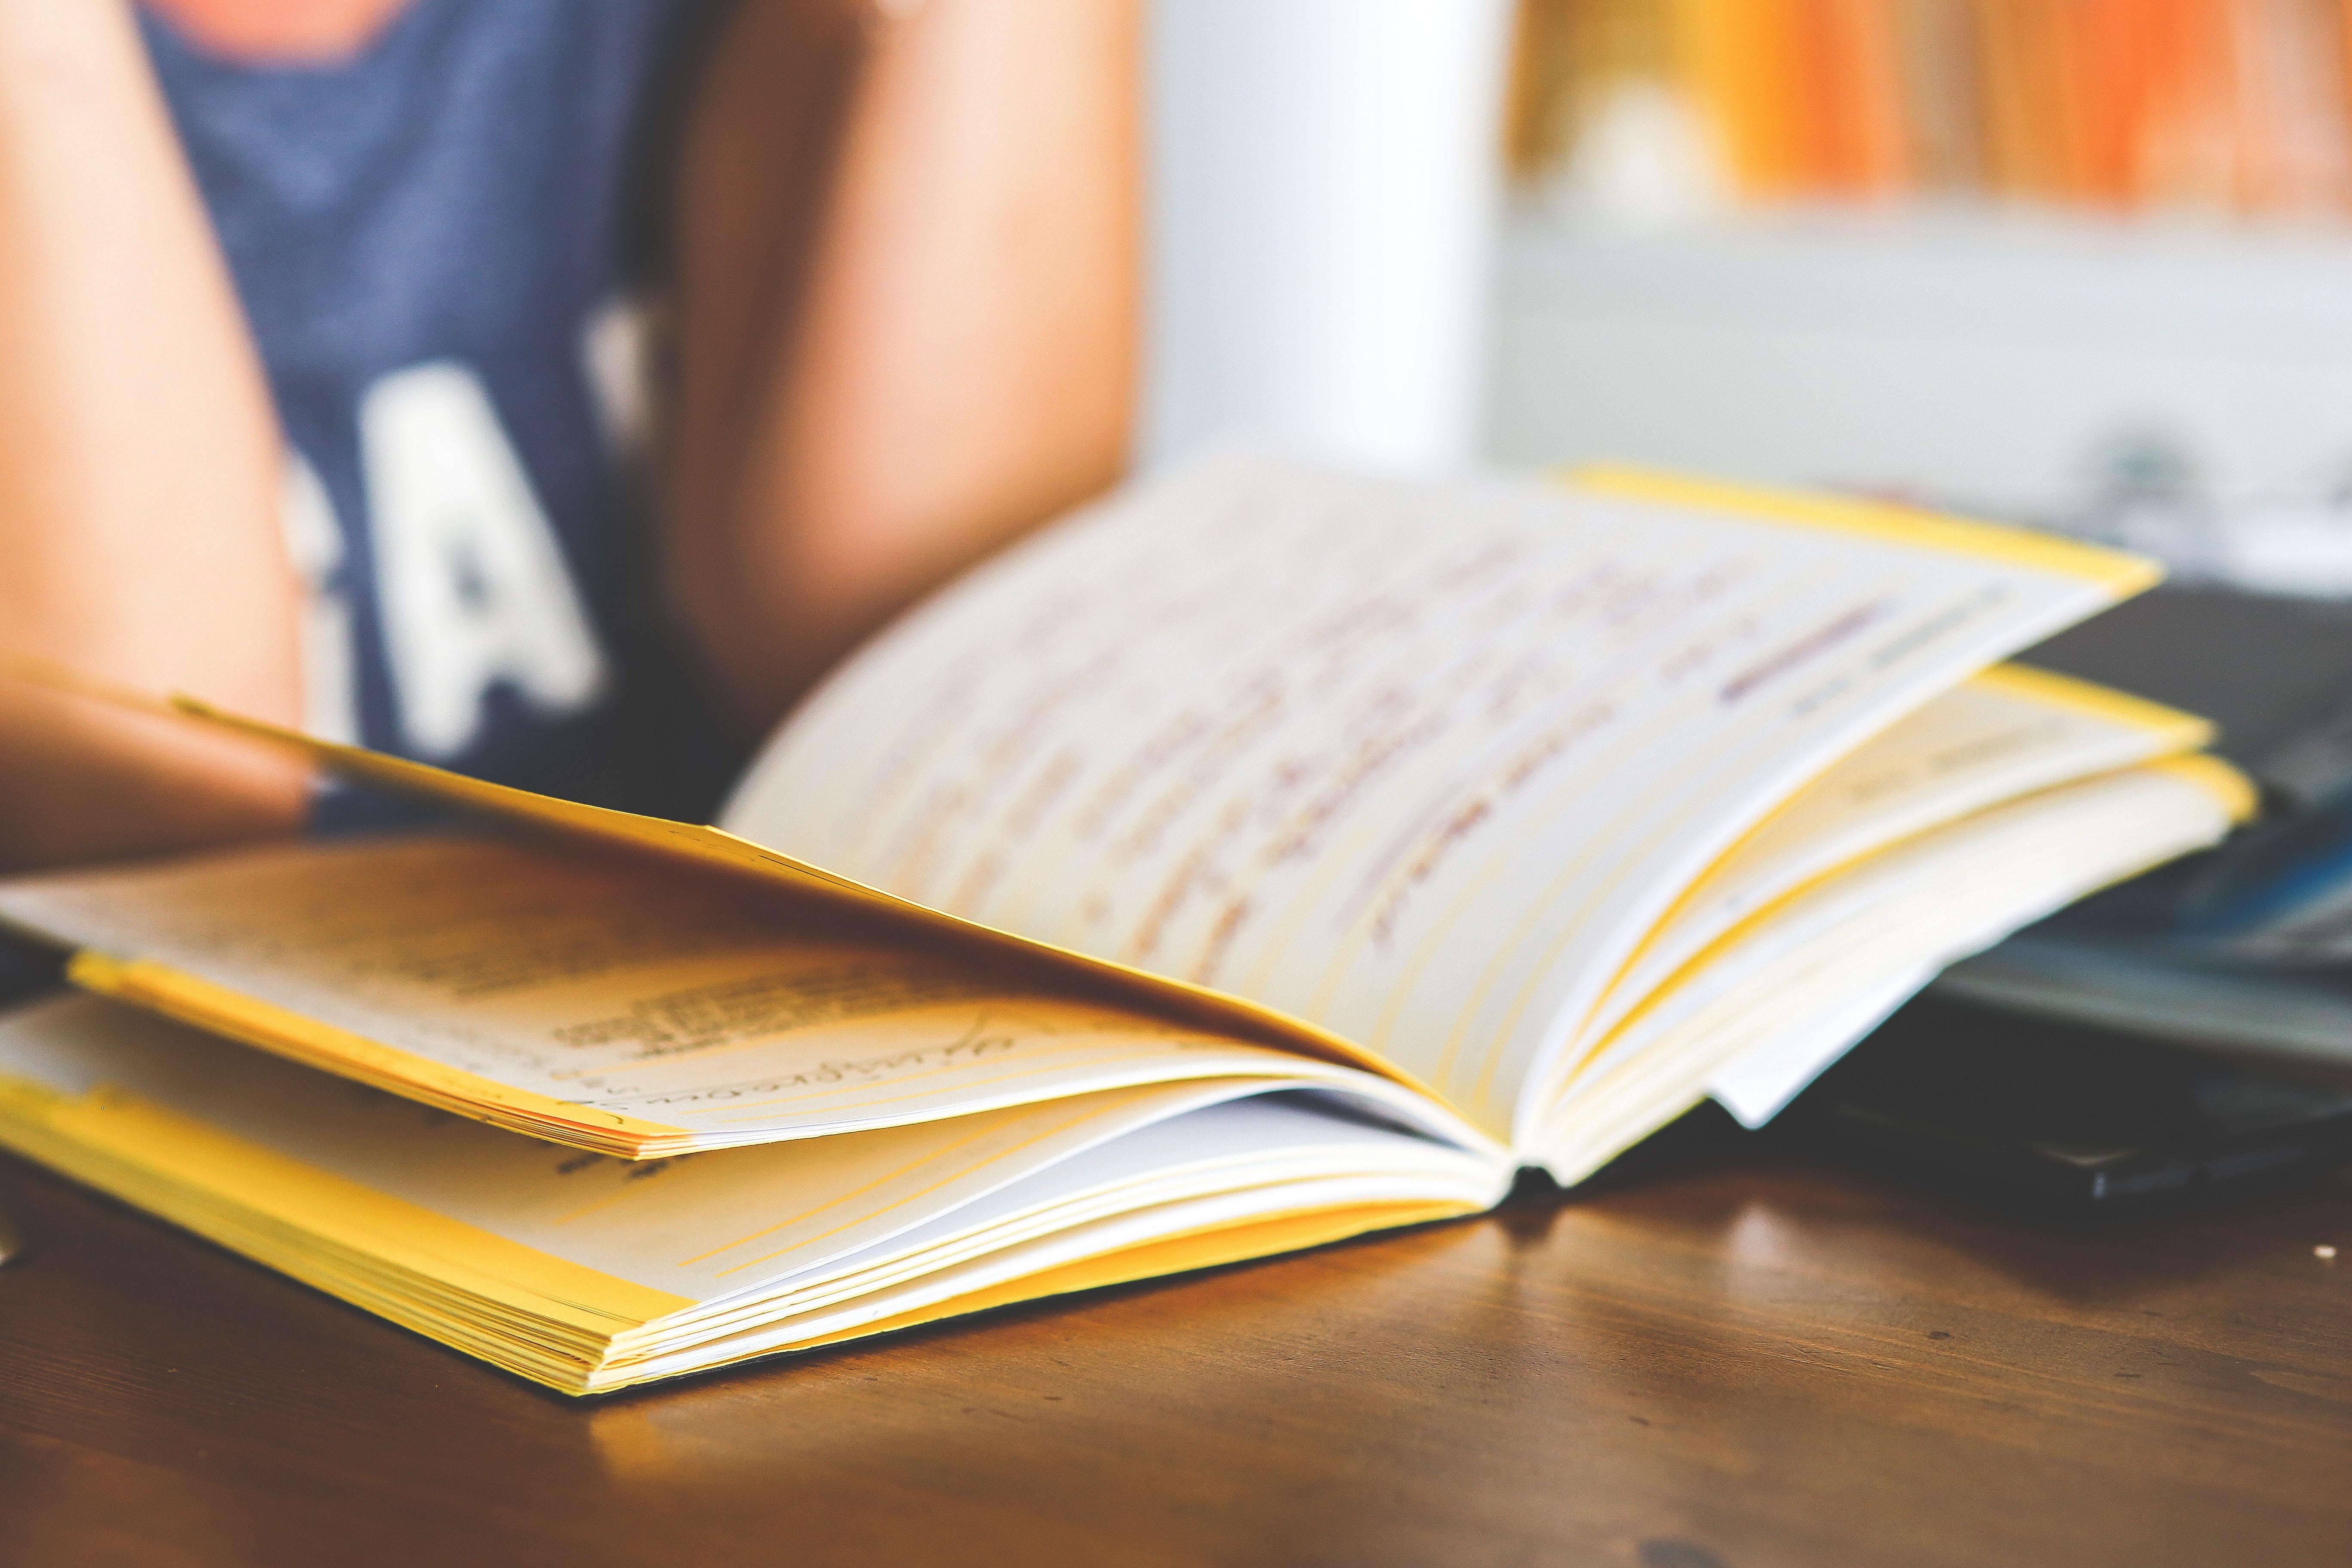 Importance of reading skills